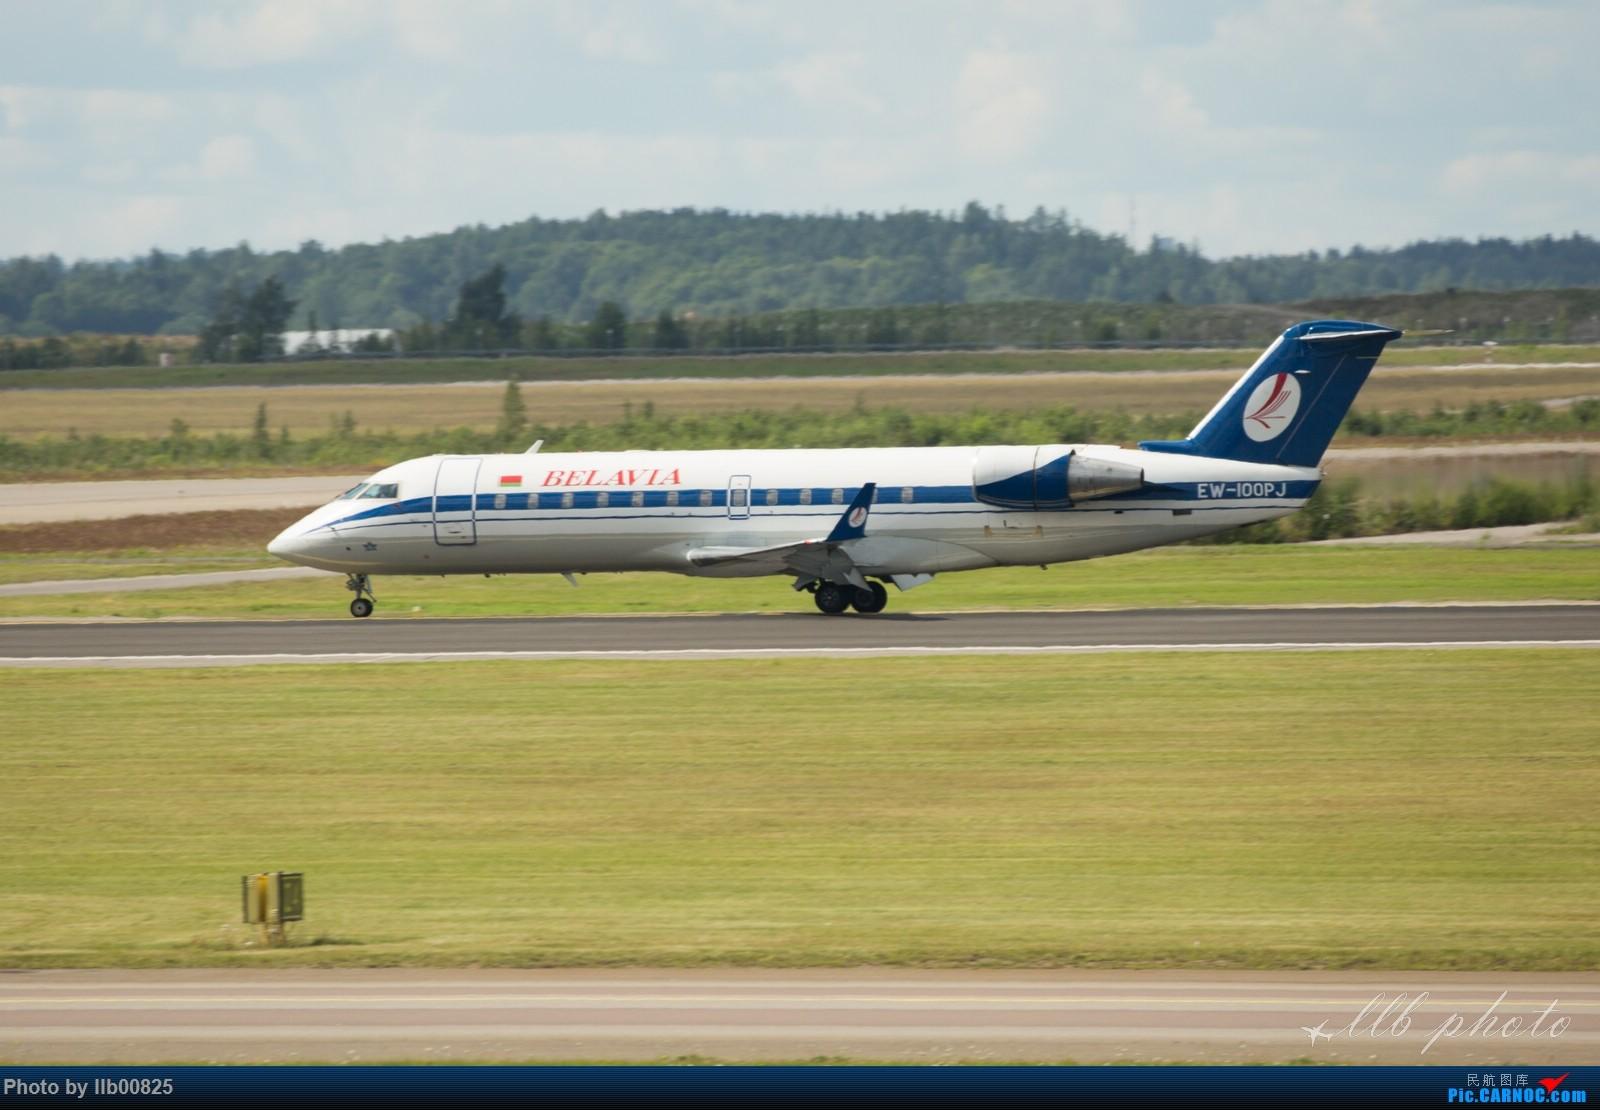 Re:[原创]赫尔辛基-布鲁塞尔一些杂图 BOMBARDIER CL-600 EW-100PJ 芬兰赫尔辛基机场